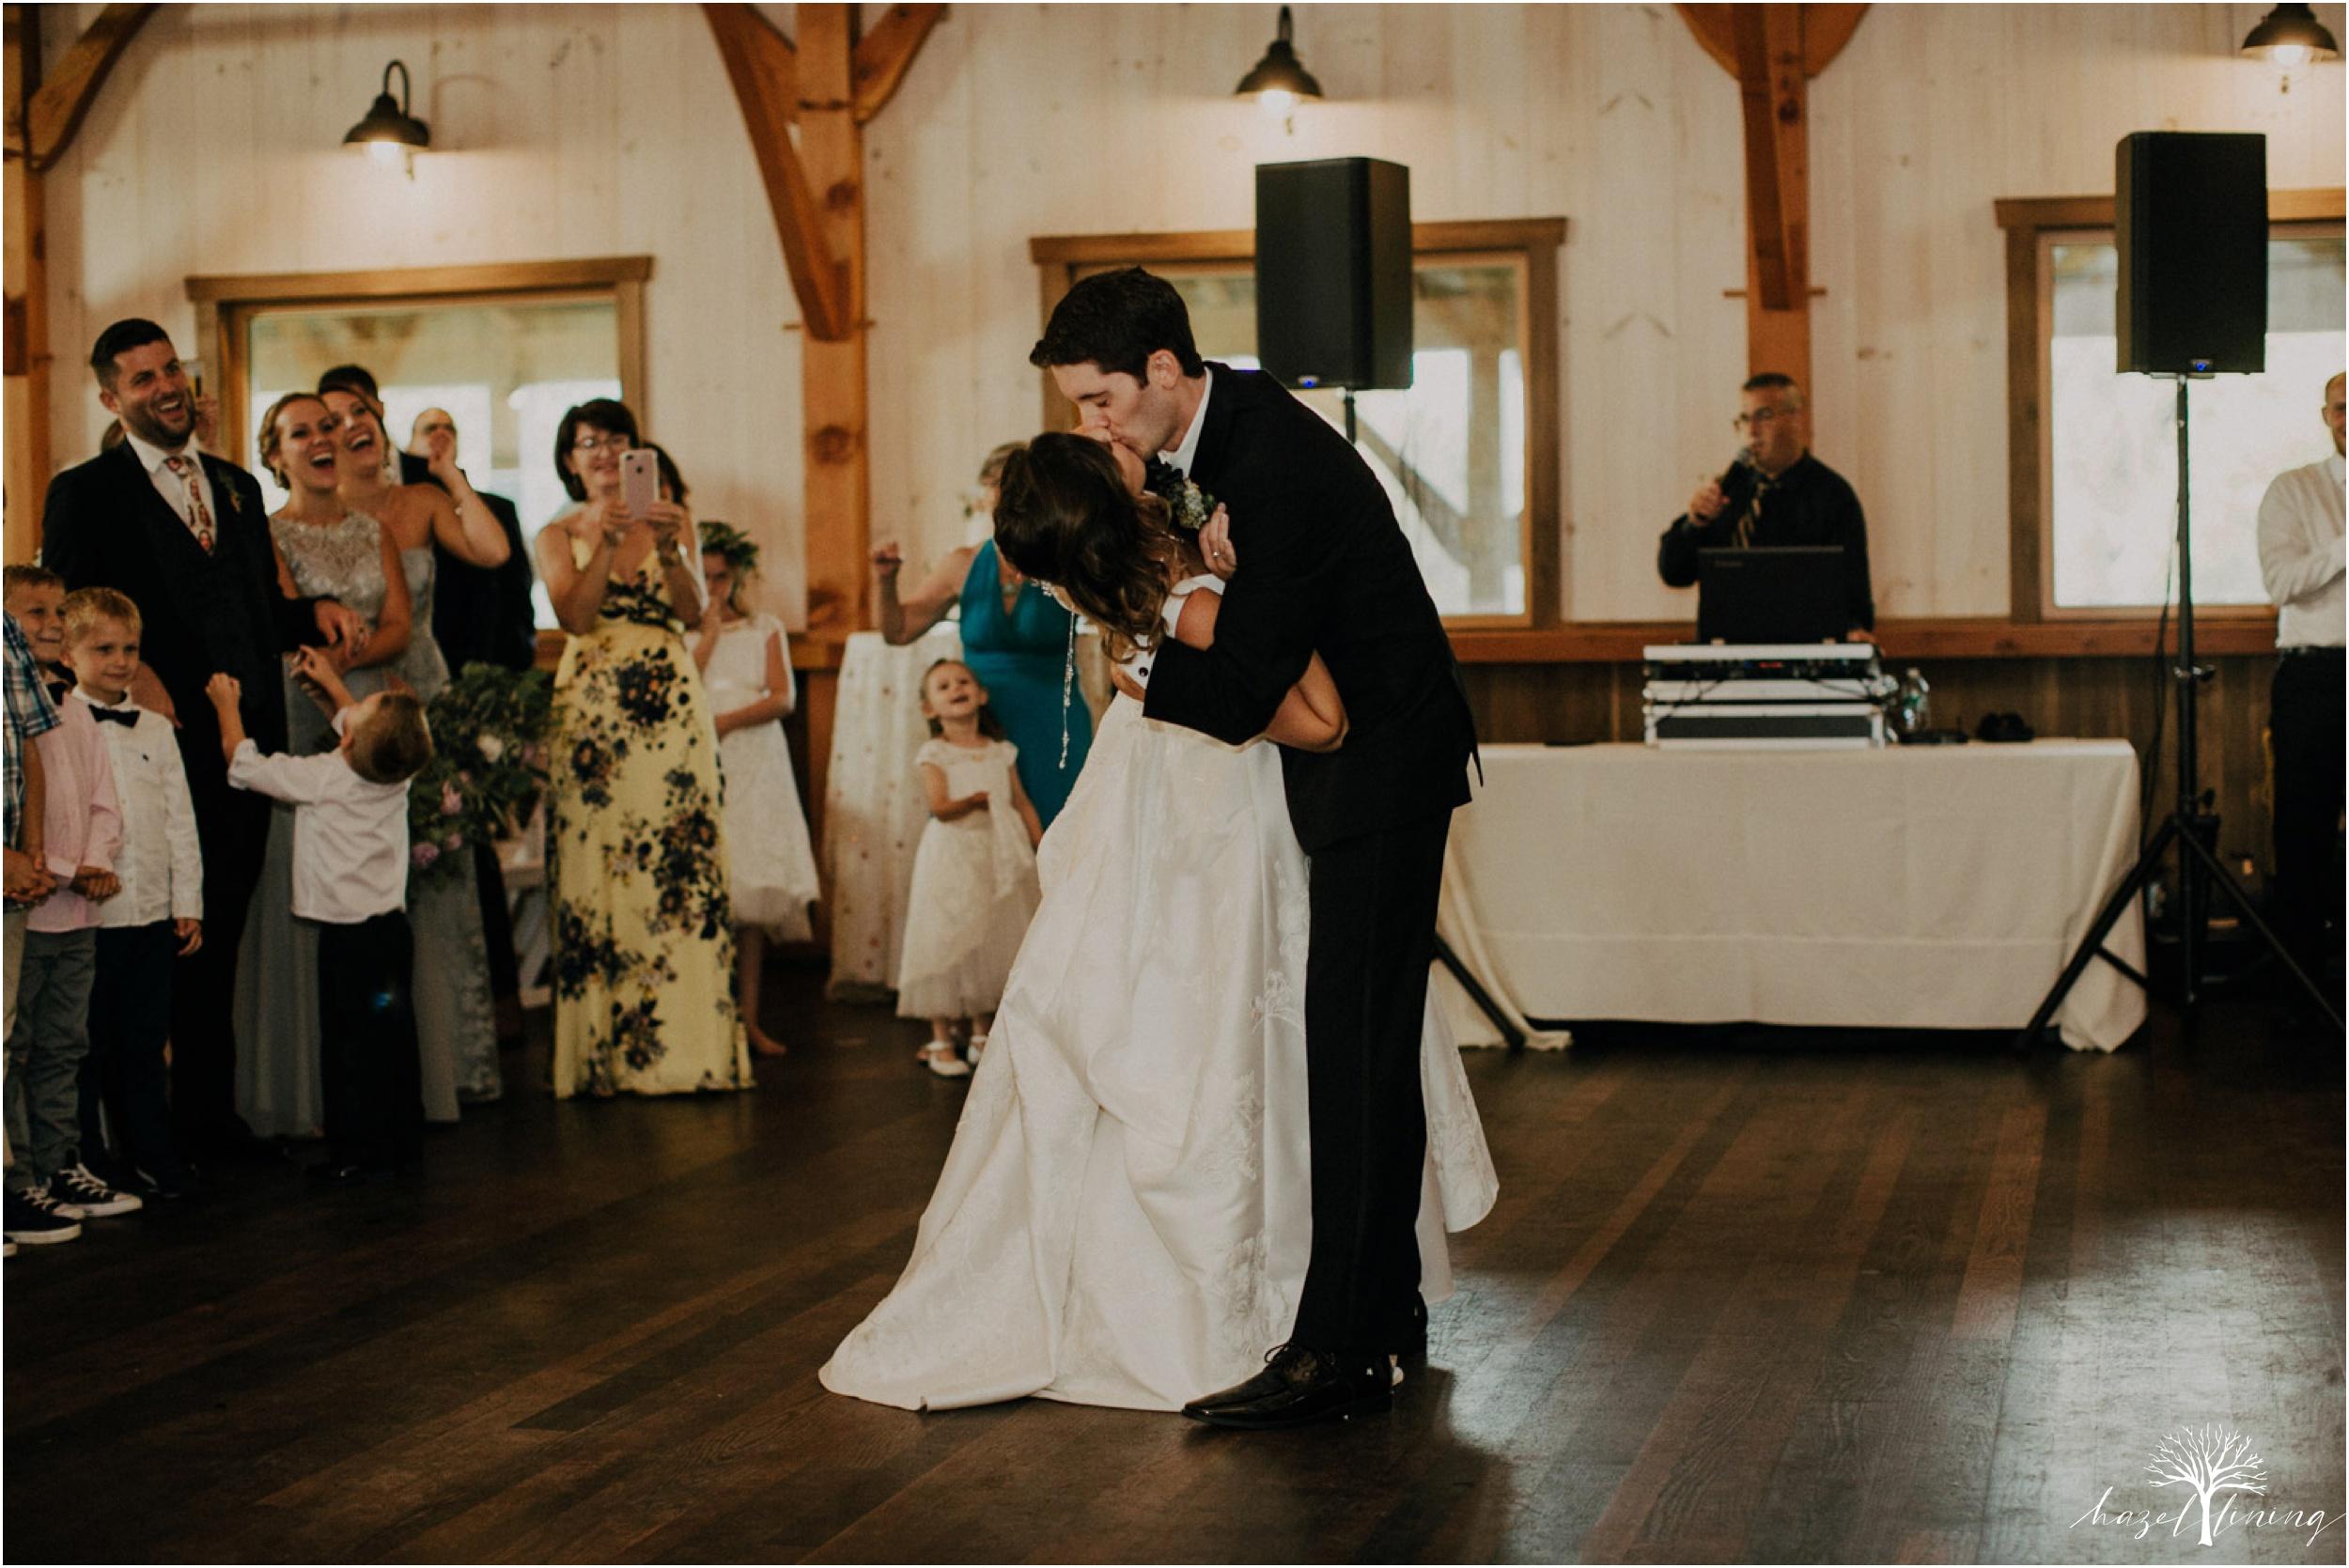 maureen-hepner-anthony-giordano-rose-bank-winery-newtow-pennsylvania-luxury-summer-wedding-hazel-lining-photography-destination-elopement-wedding-engagement-photography_0137.jpg